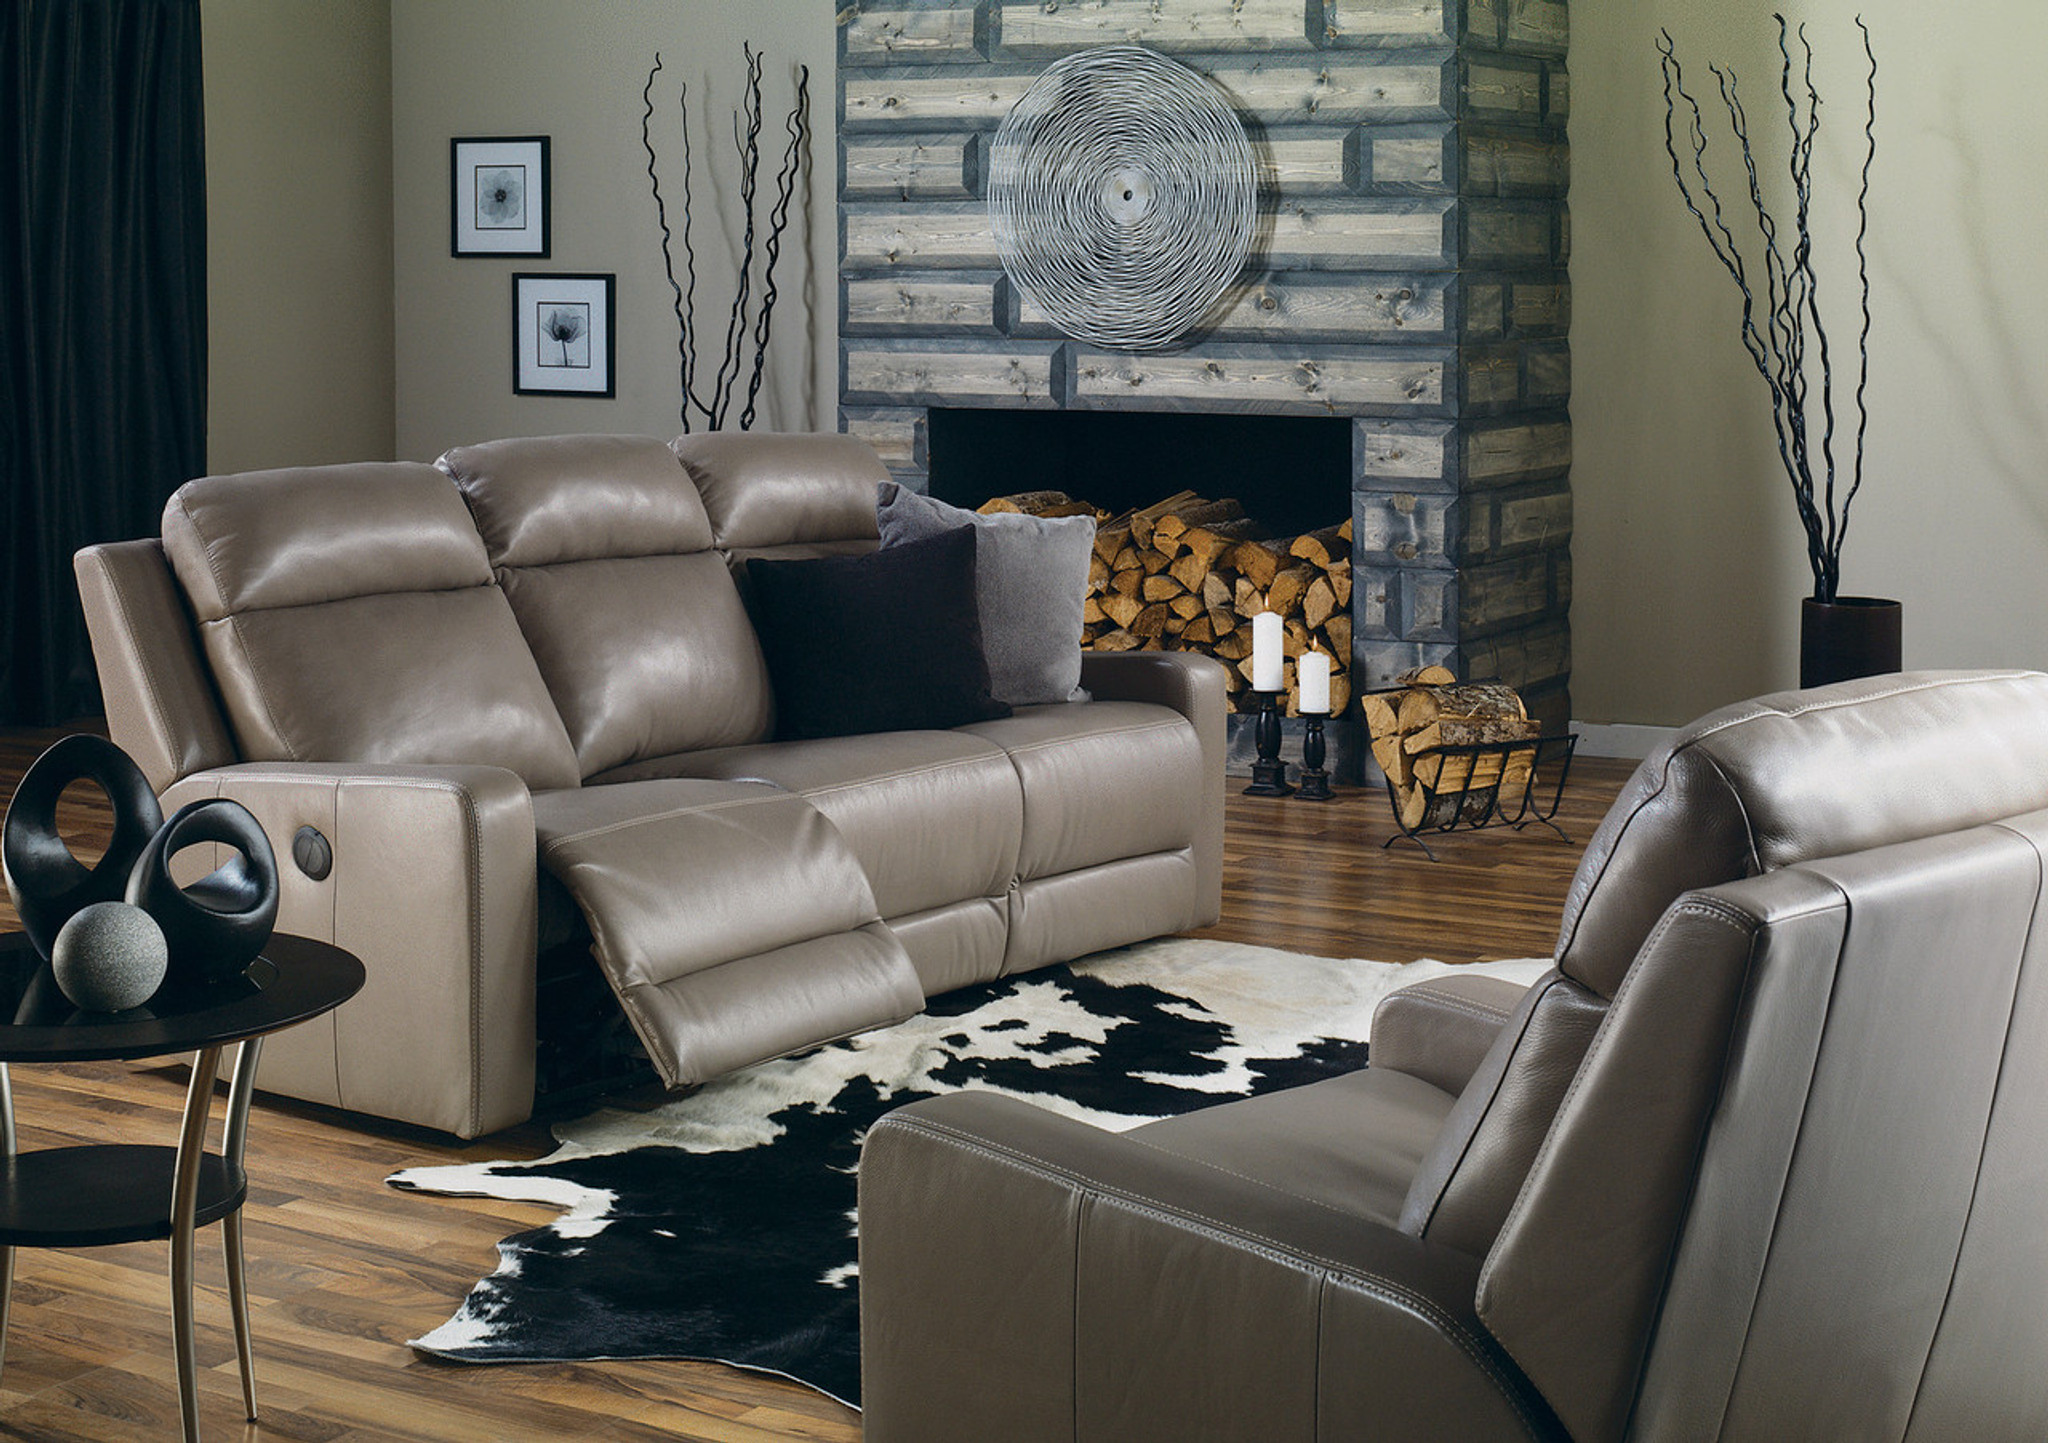 Palliser Leather Recliner Sofa ModelForest Hill 41032